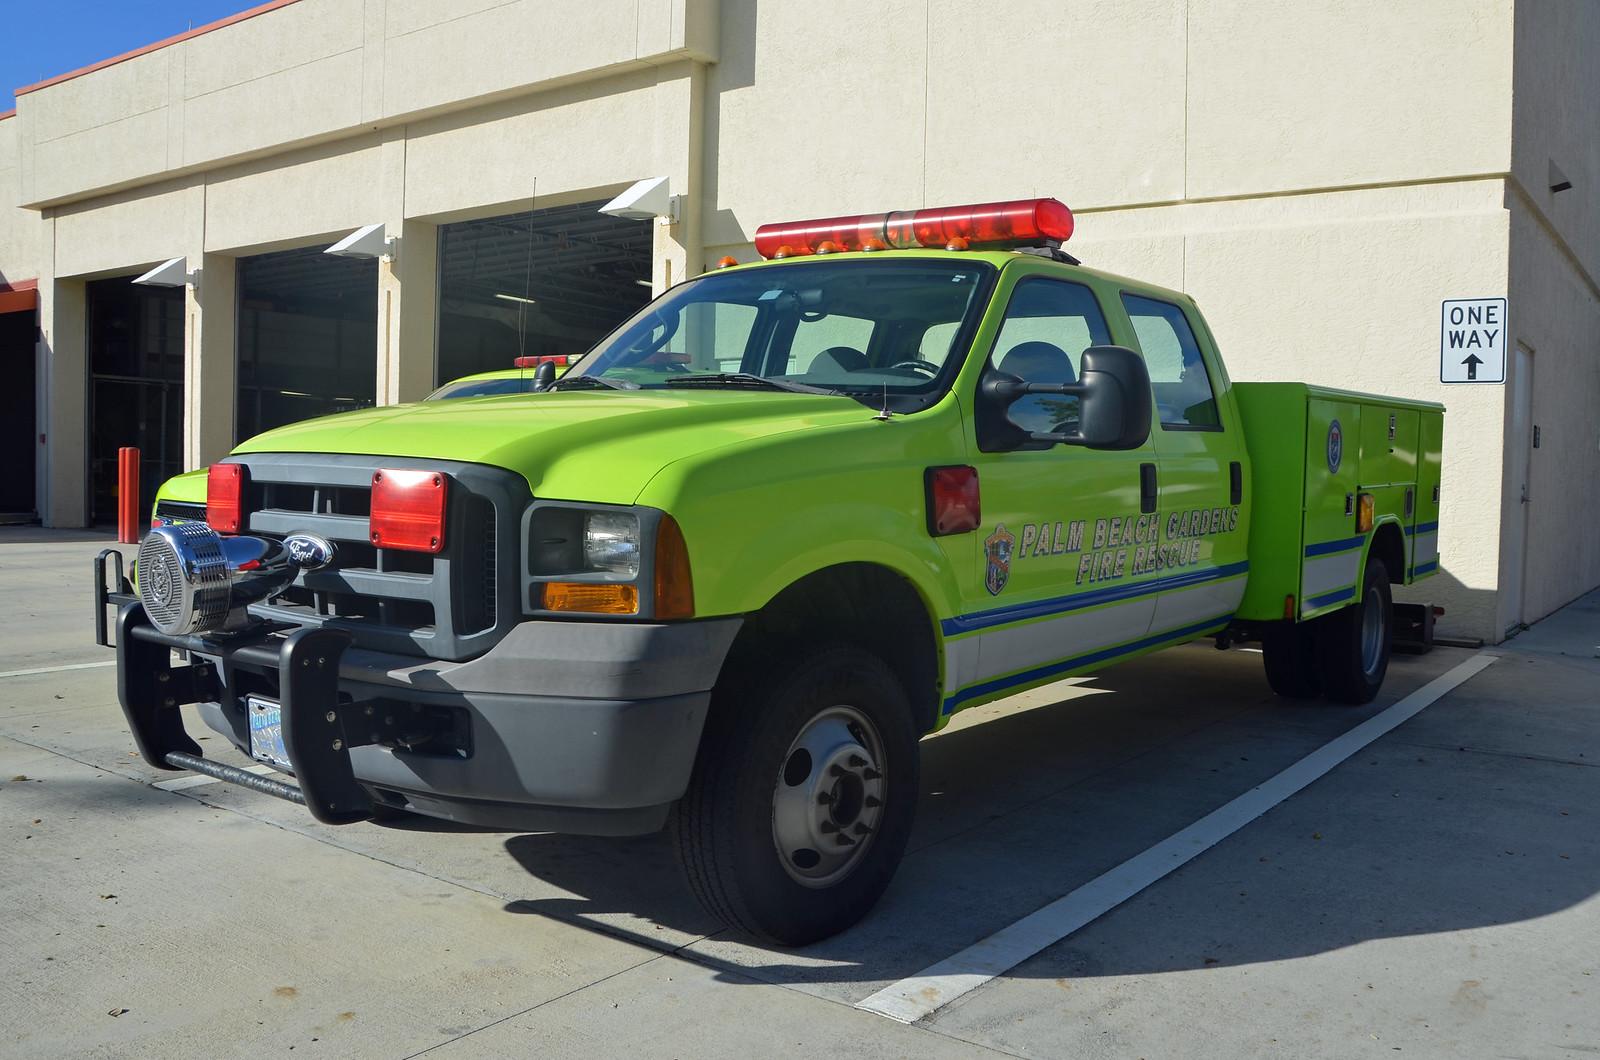 Palm Beach Gardens Fire Rescue   Flickr